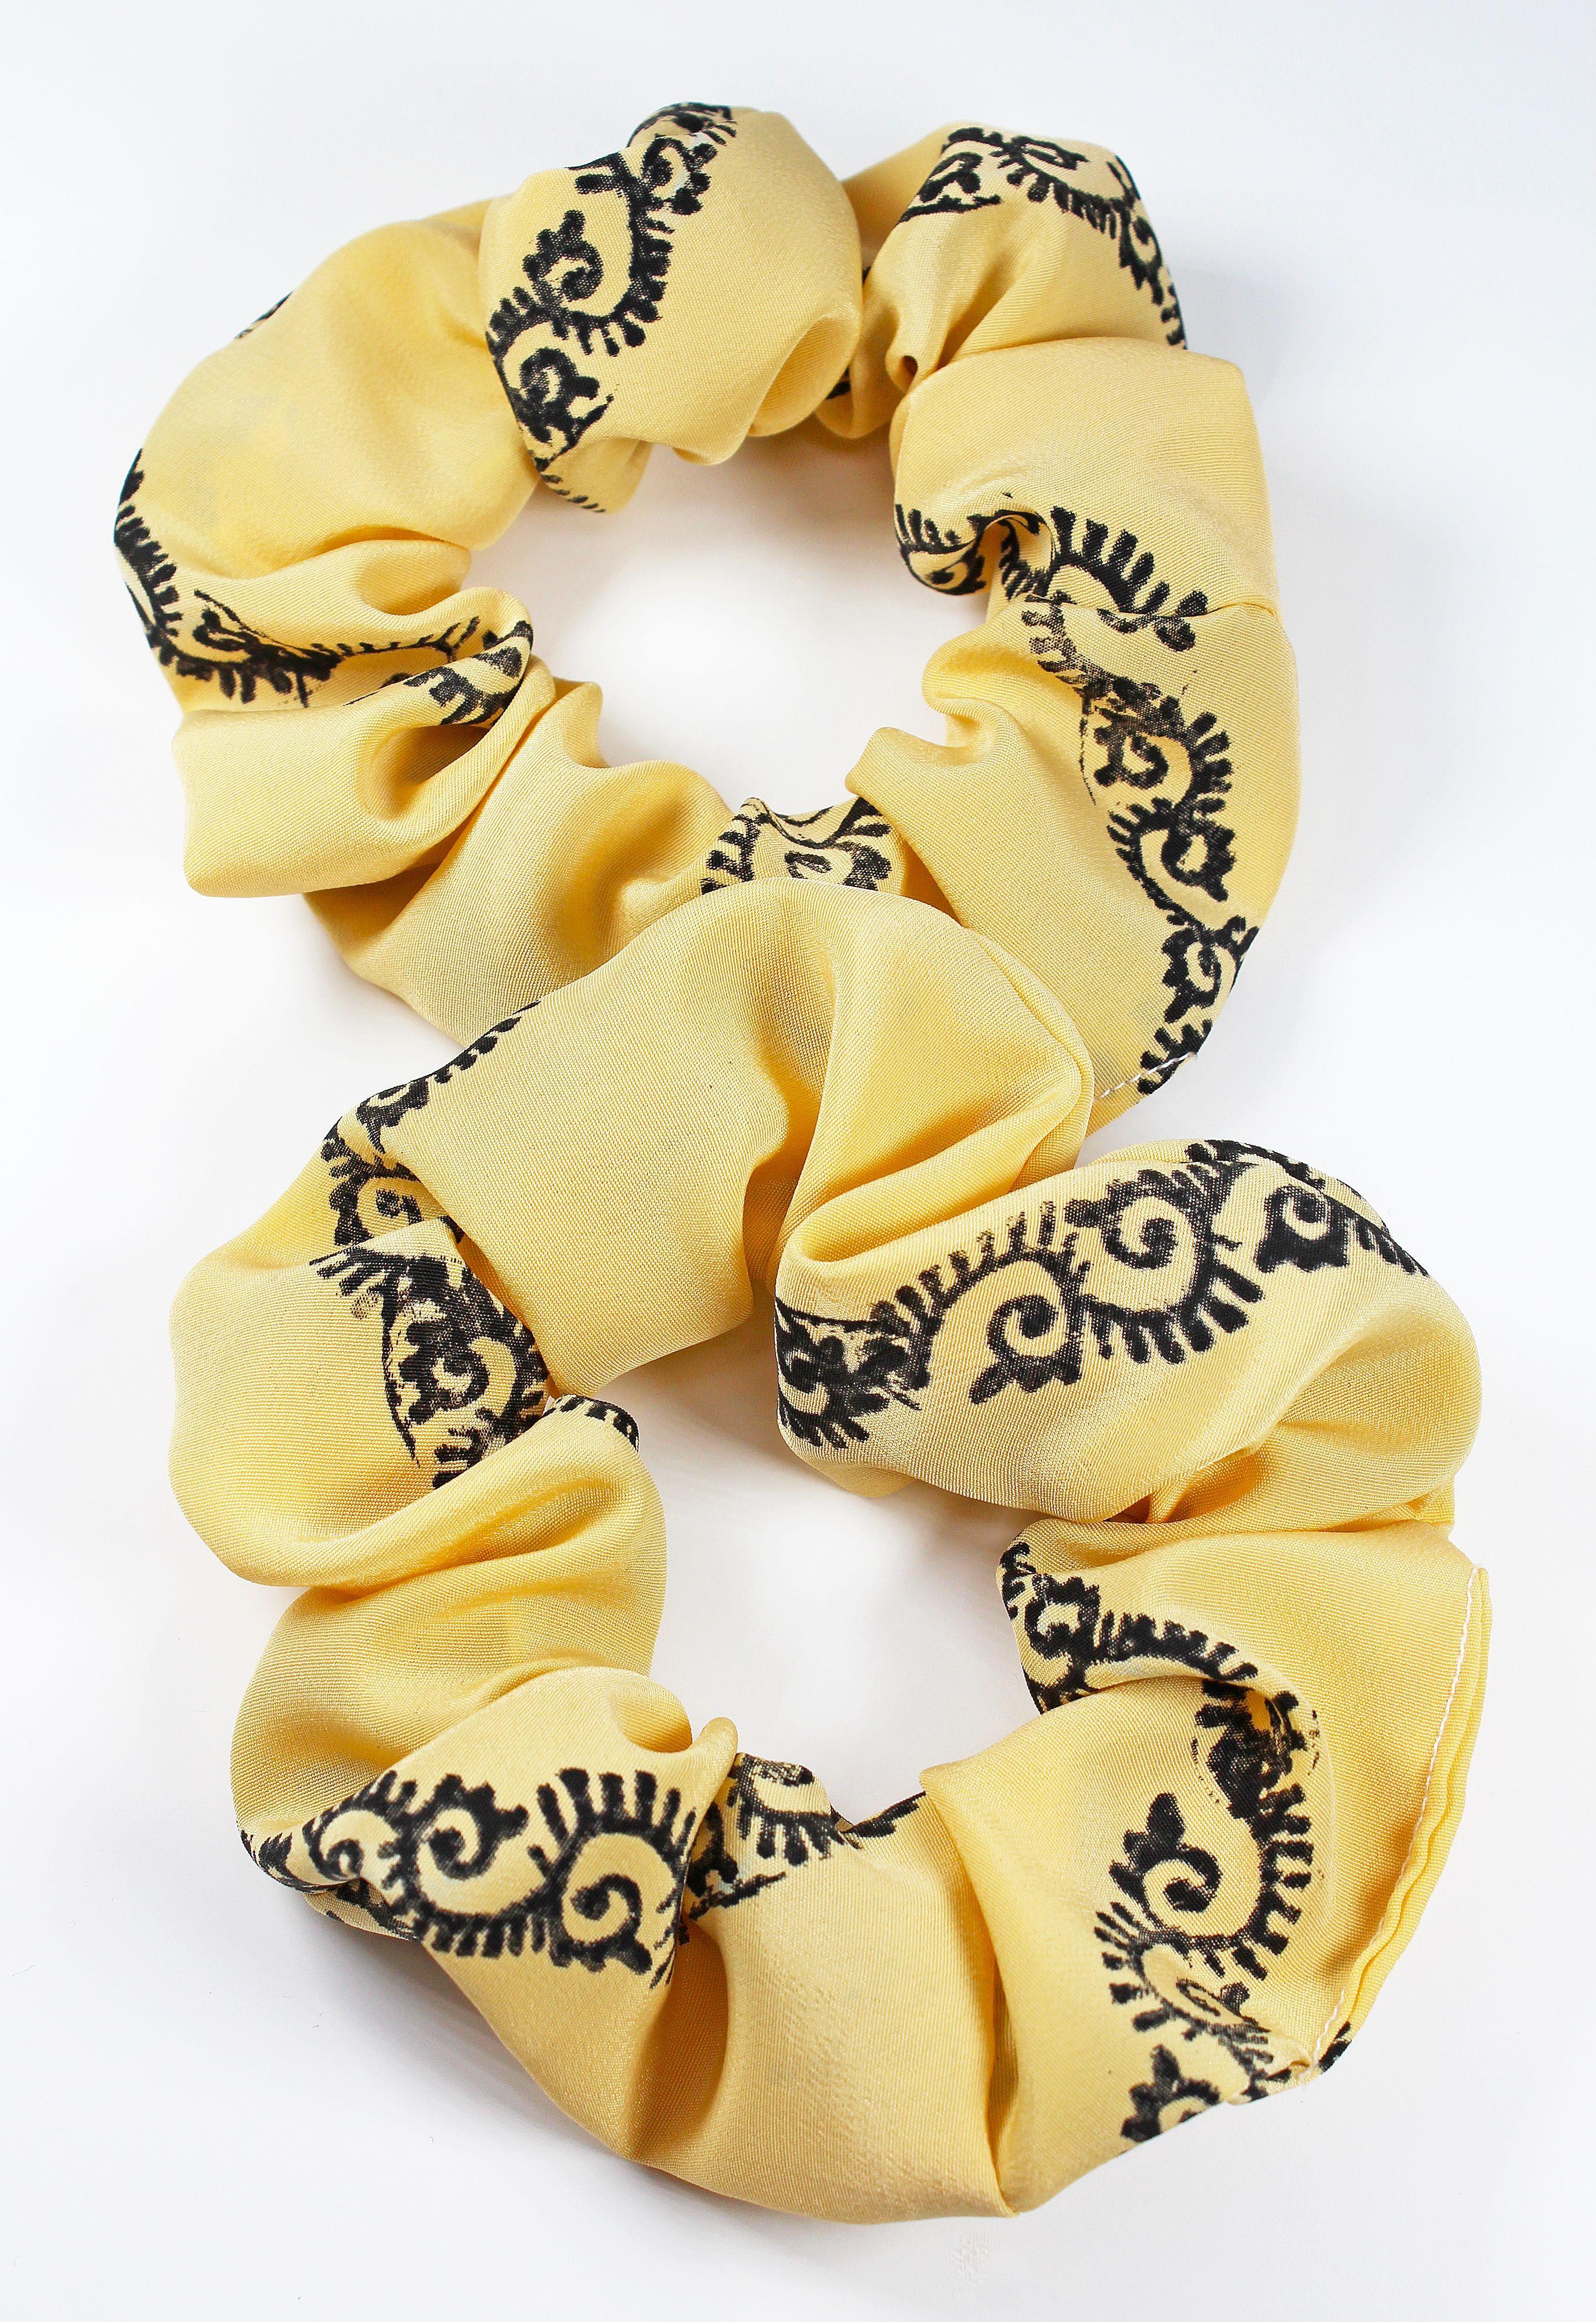 Hand Painted Swirl Print Hair Scrunchie #hairscrunchie Pull your hair up with our Hand Painted Swirl Print Hair Scrunchie. Hair scrunchie, hair scrunchies, hair scrunchy, leaf, black, white, etsy, hair ties, ponytail, hair tied back, top knot favors, hair bun, hairstyle, hairdo, party favors, handmade #hairscrunchie